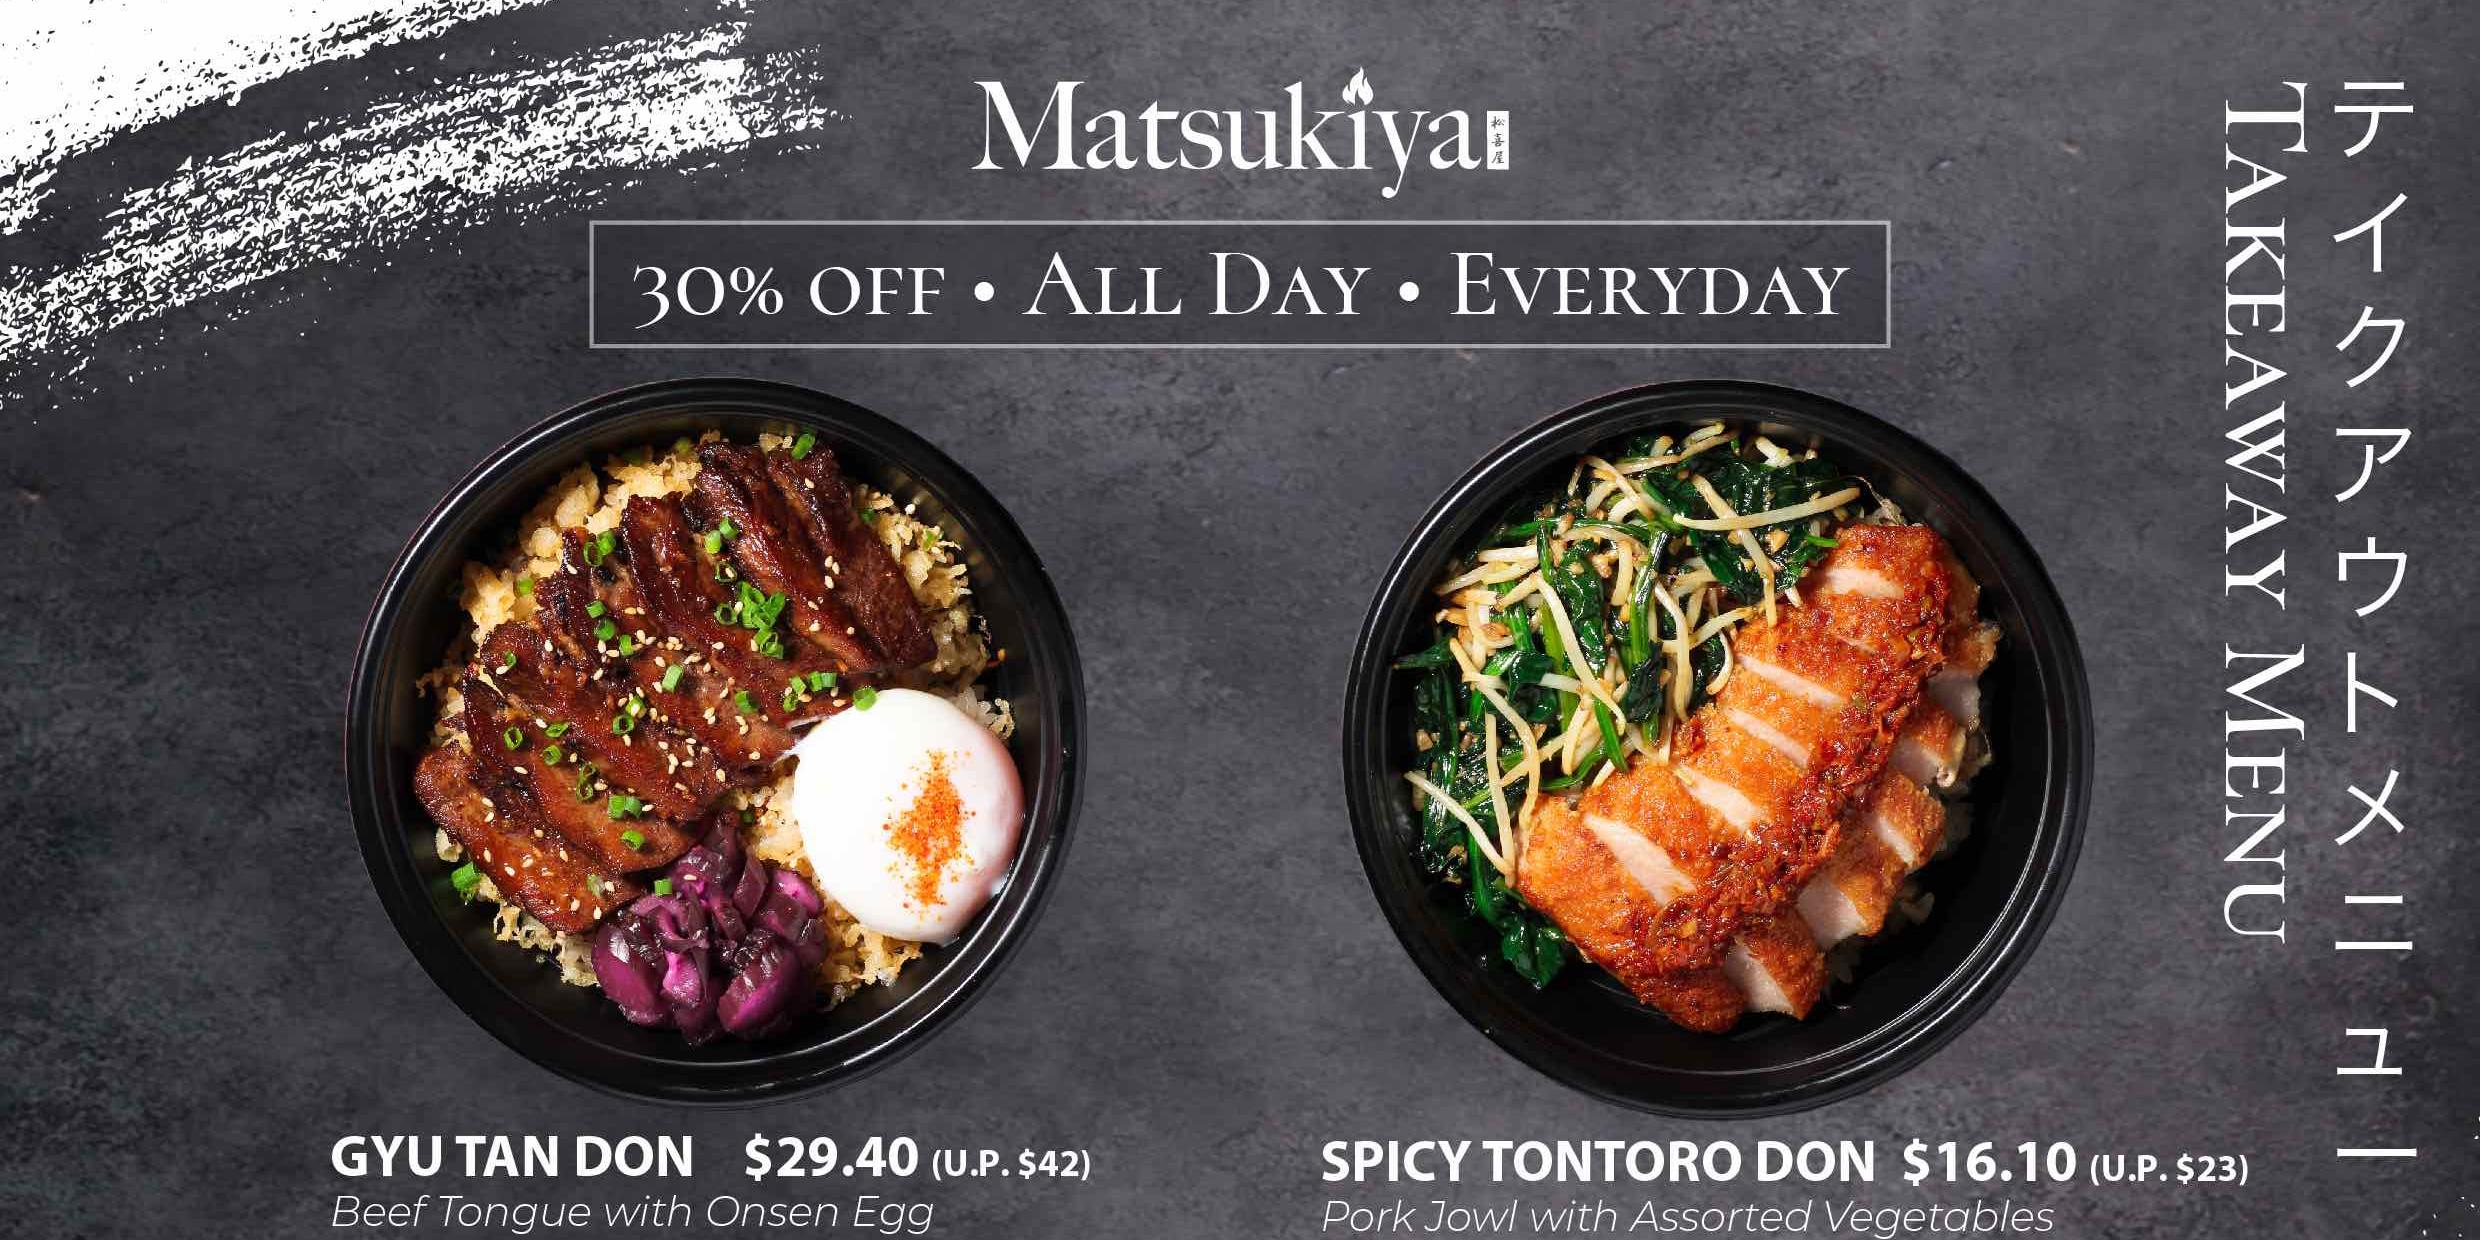 30% discount on Deliveroo and takeaways at Matsukiya